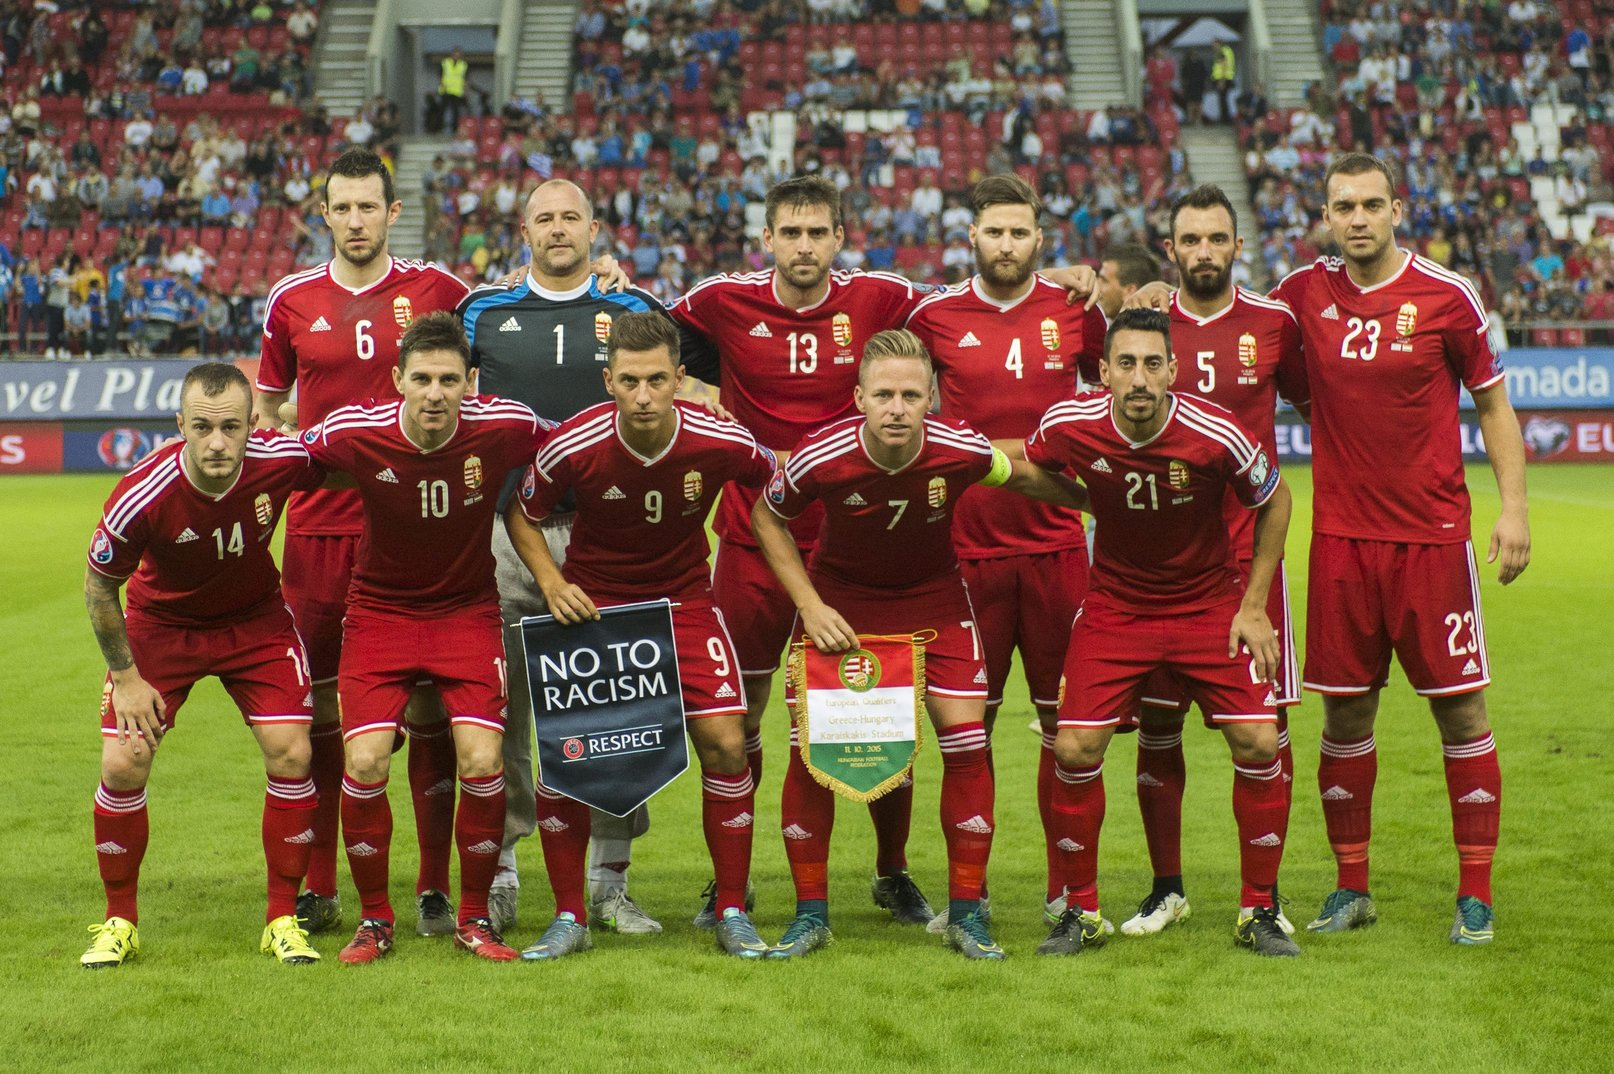 Euro 2016 - Hungary team profile